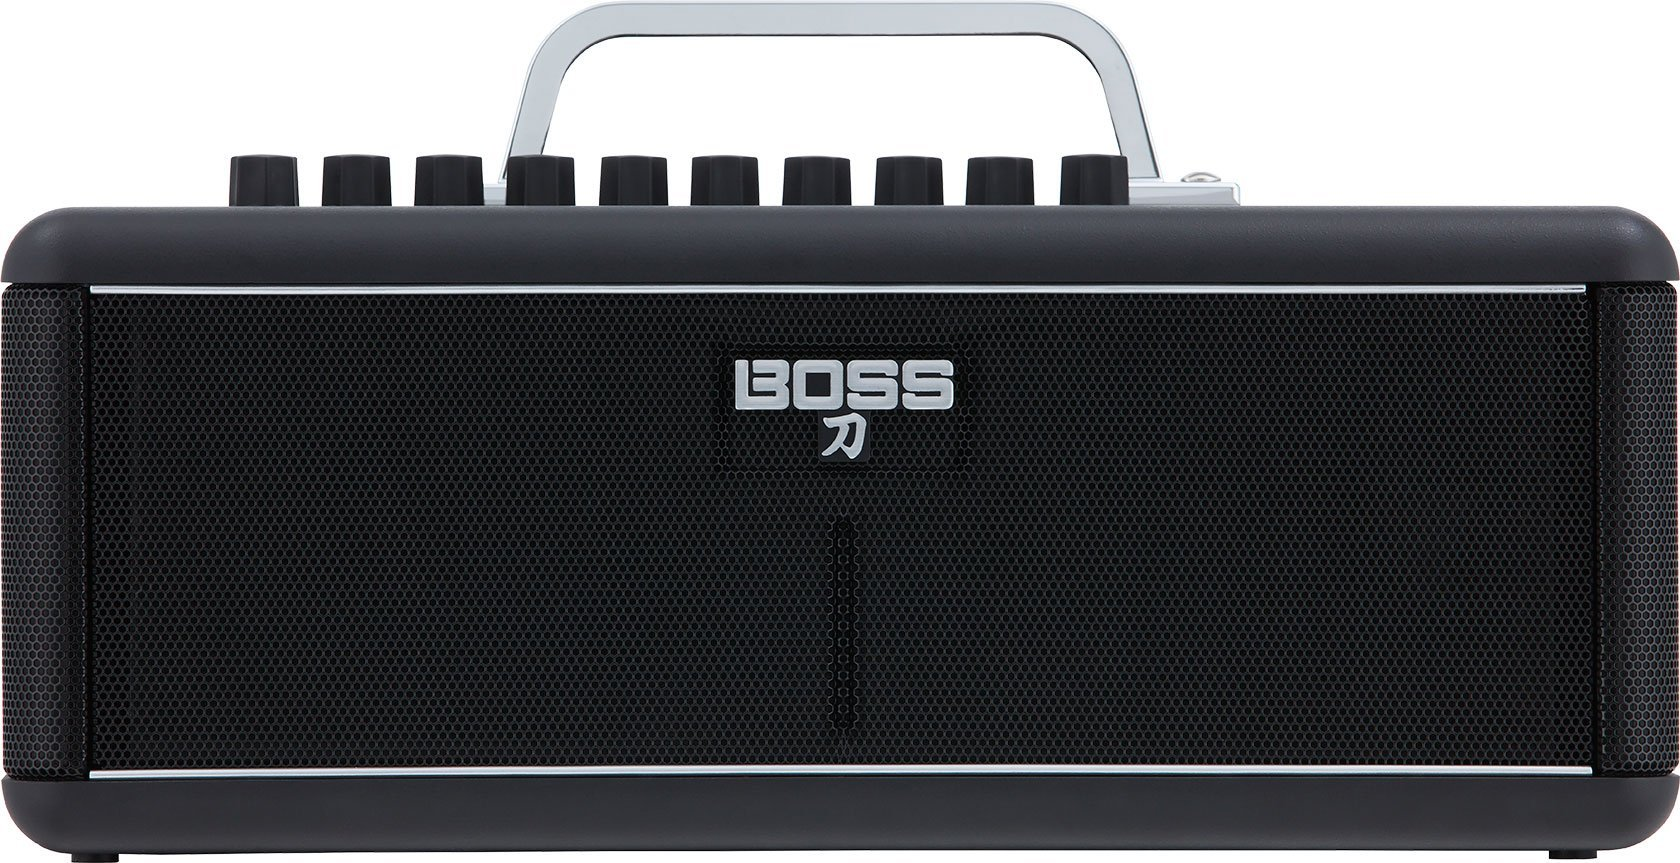 Boss Katana Air - 20/30-watt Wireless Guitar Amp by BOSS (Image #1)